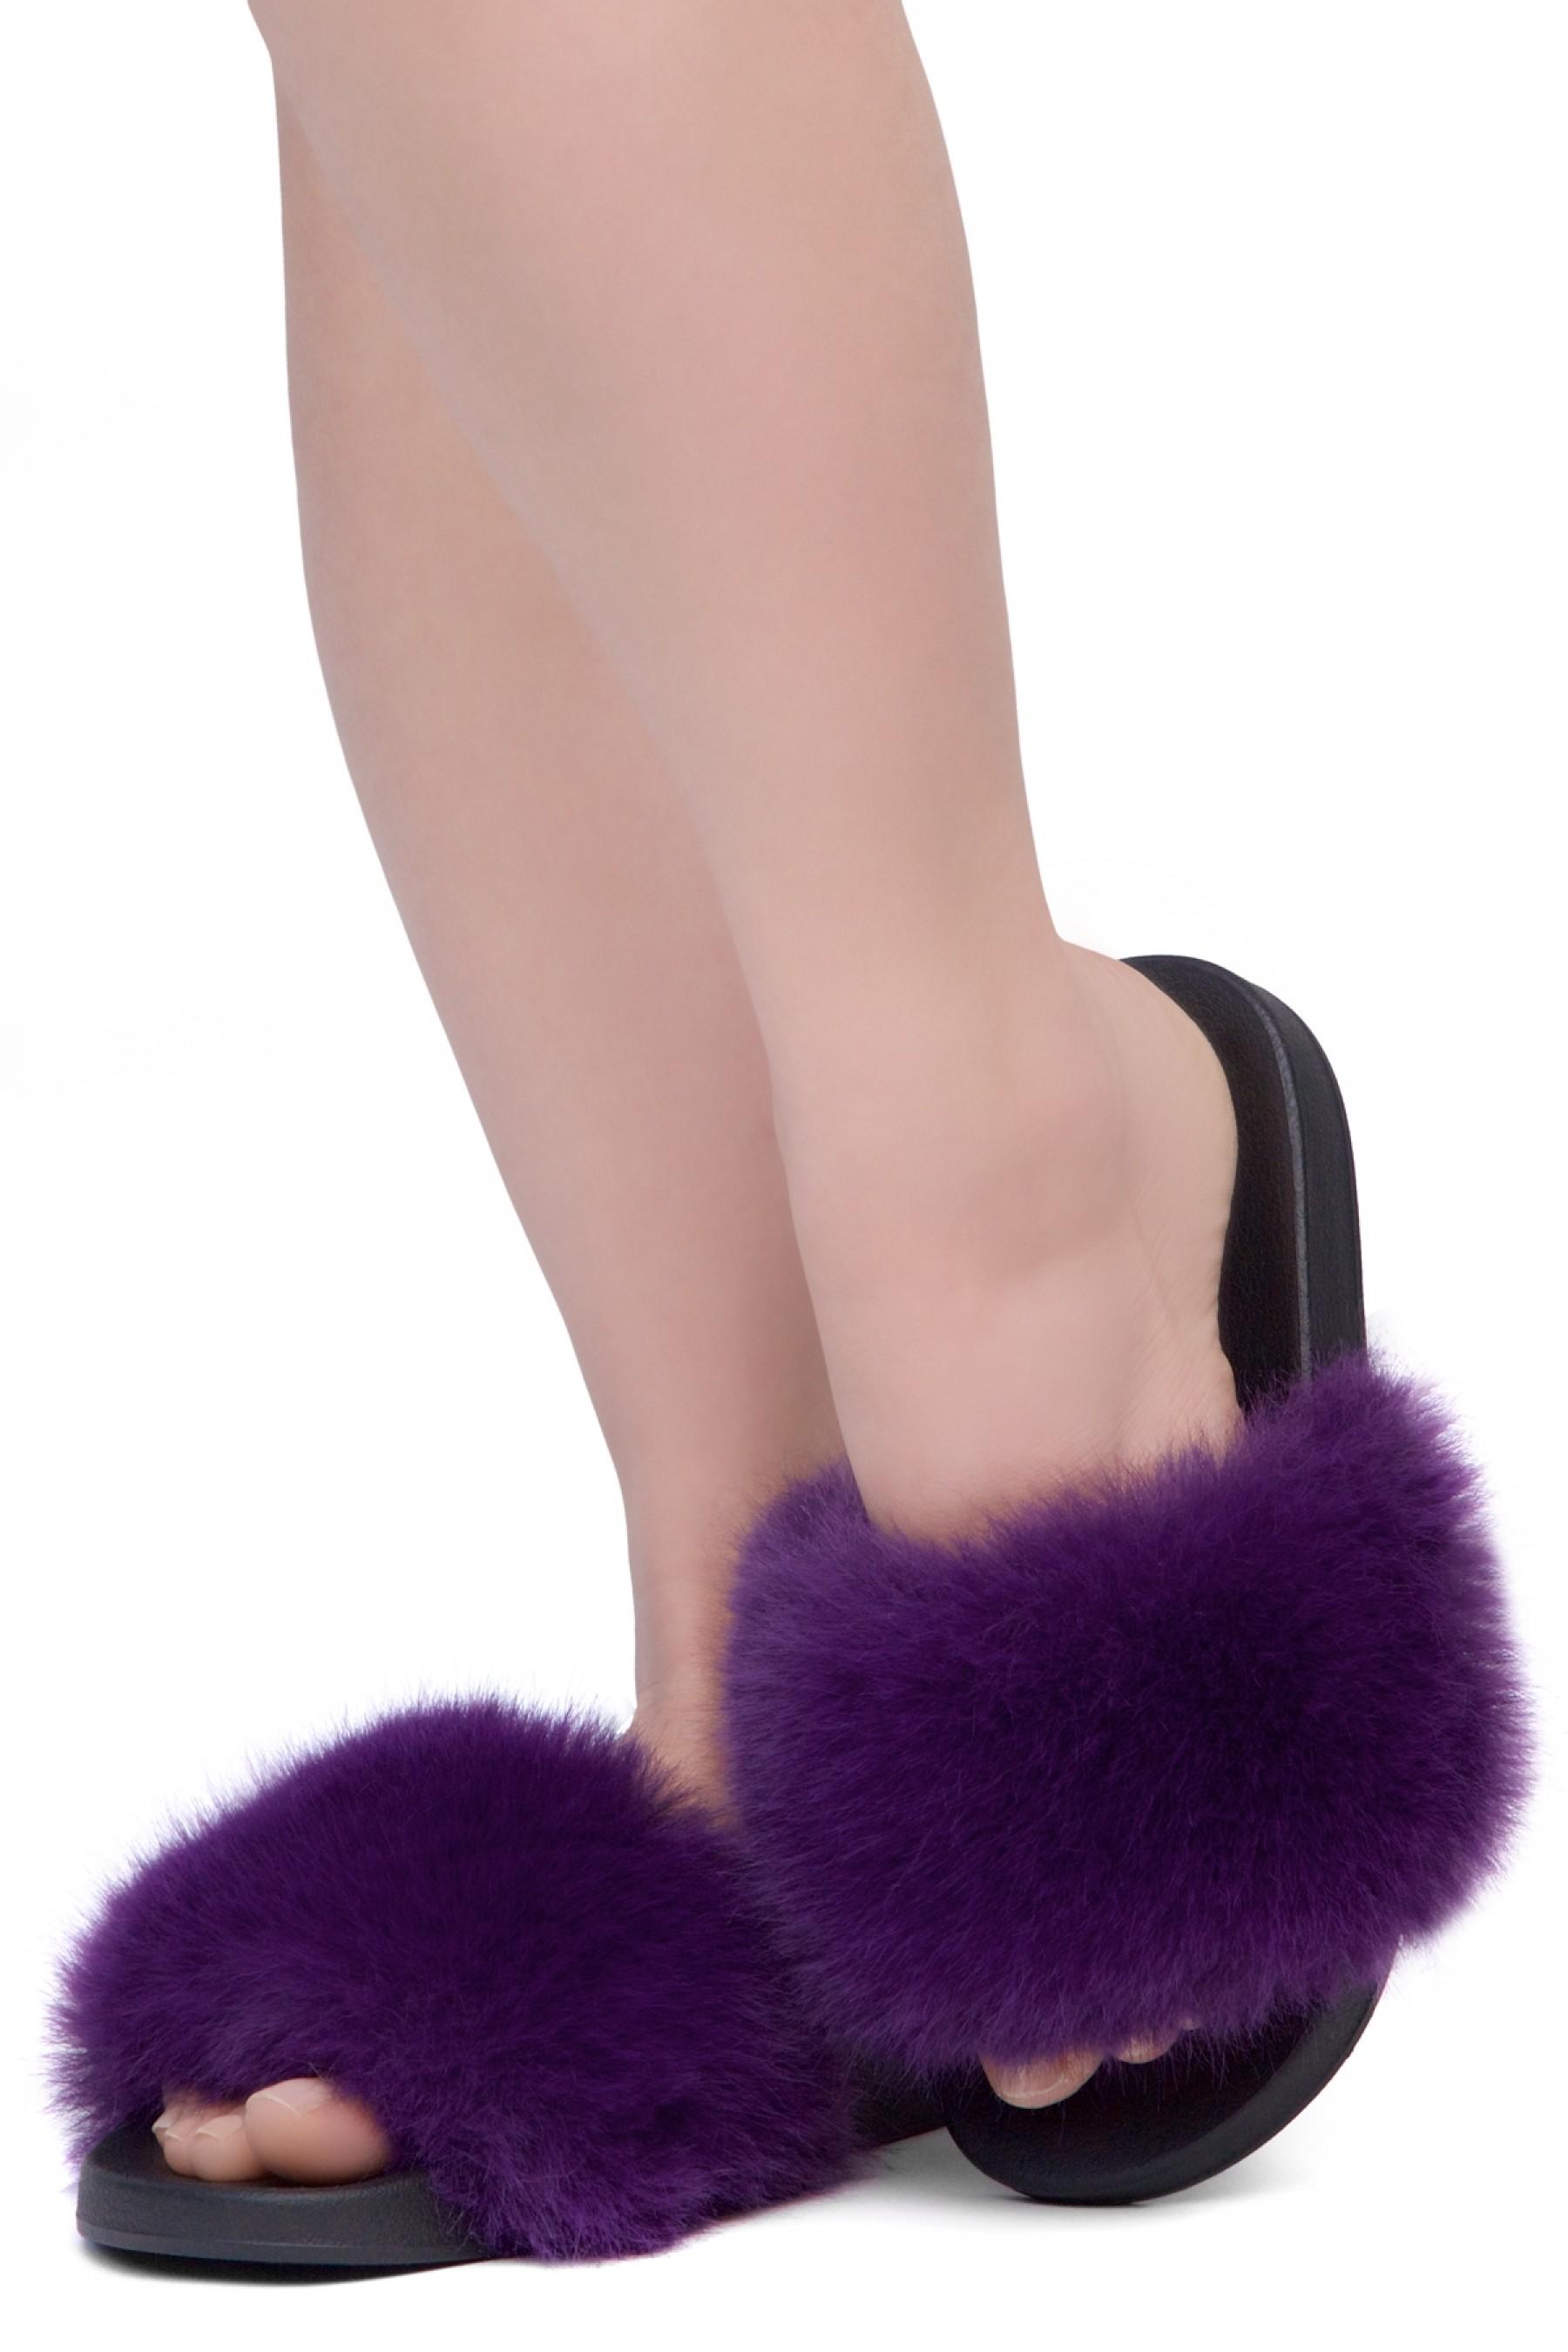 Shoe Land NIKINI Womens Fur Slides Fuzzy Slippers Fashion Fluffy Comfort Flat Sandals(2020 Purple/Black)